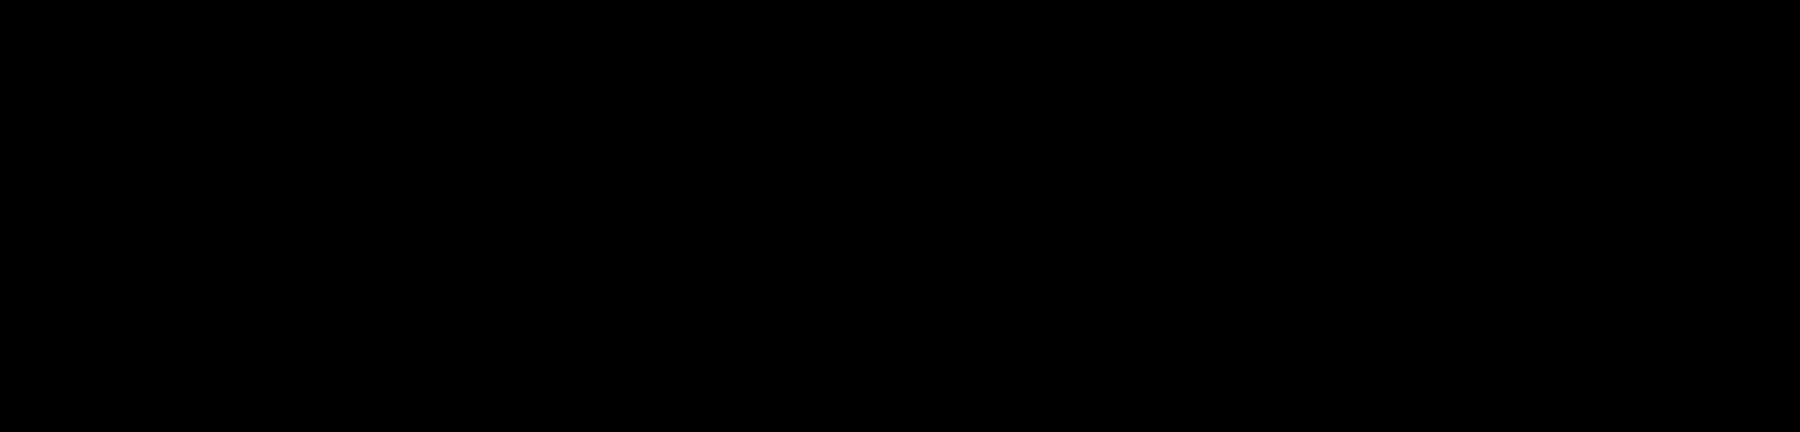 propsandpistons-1800px